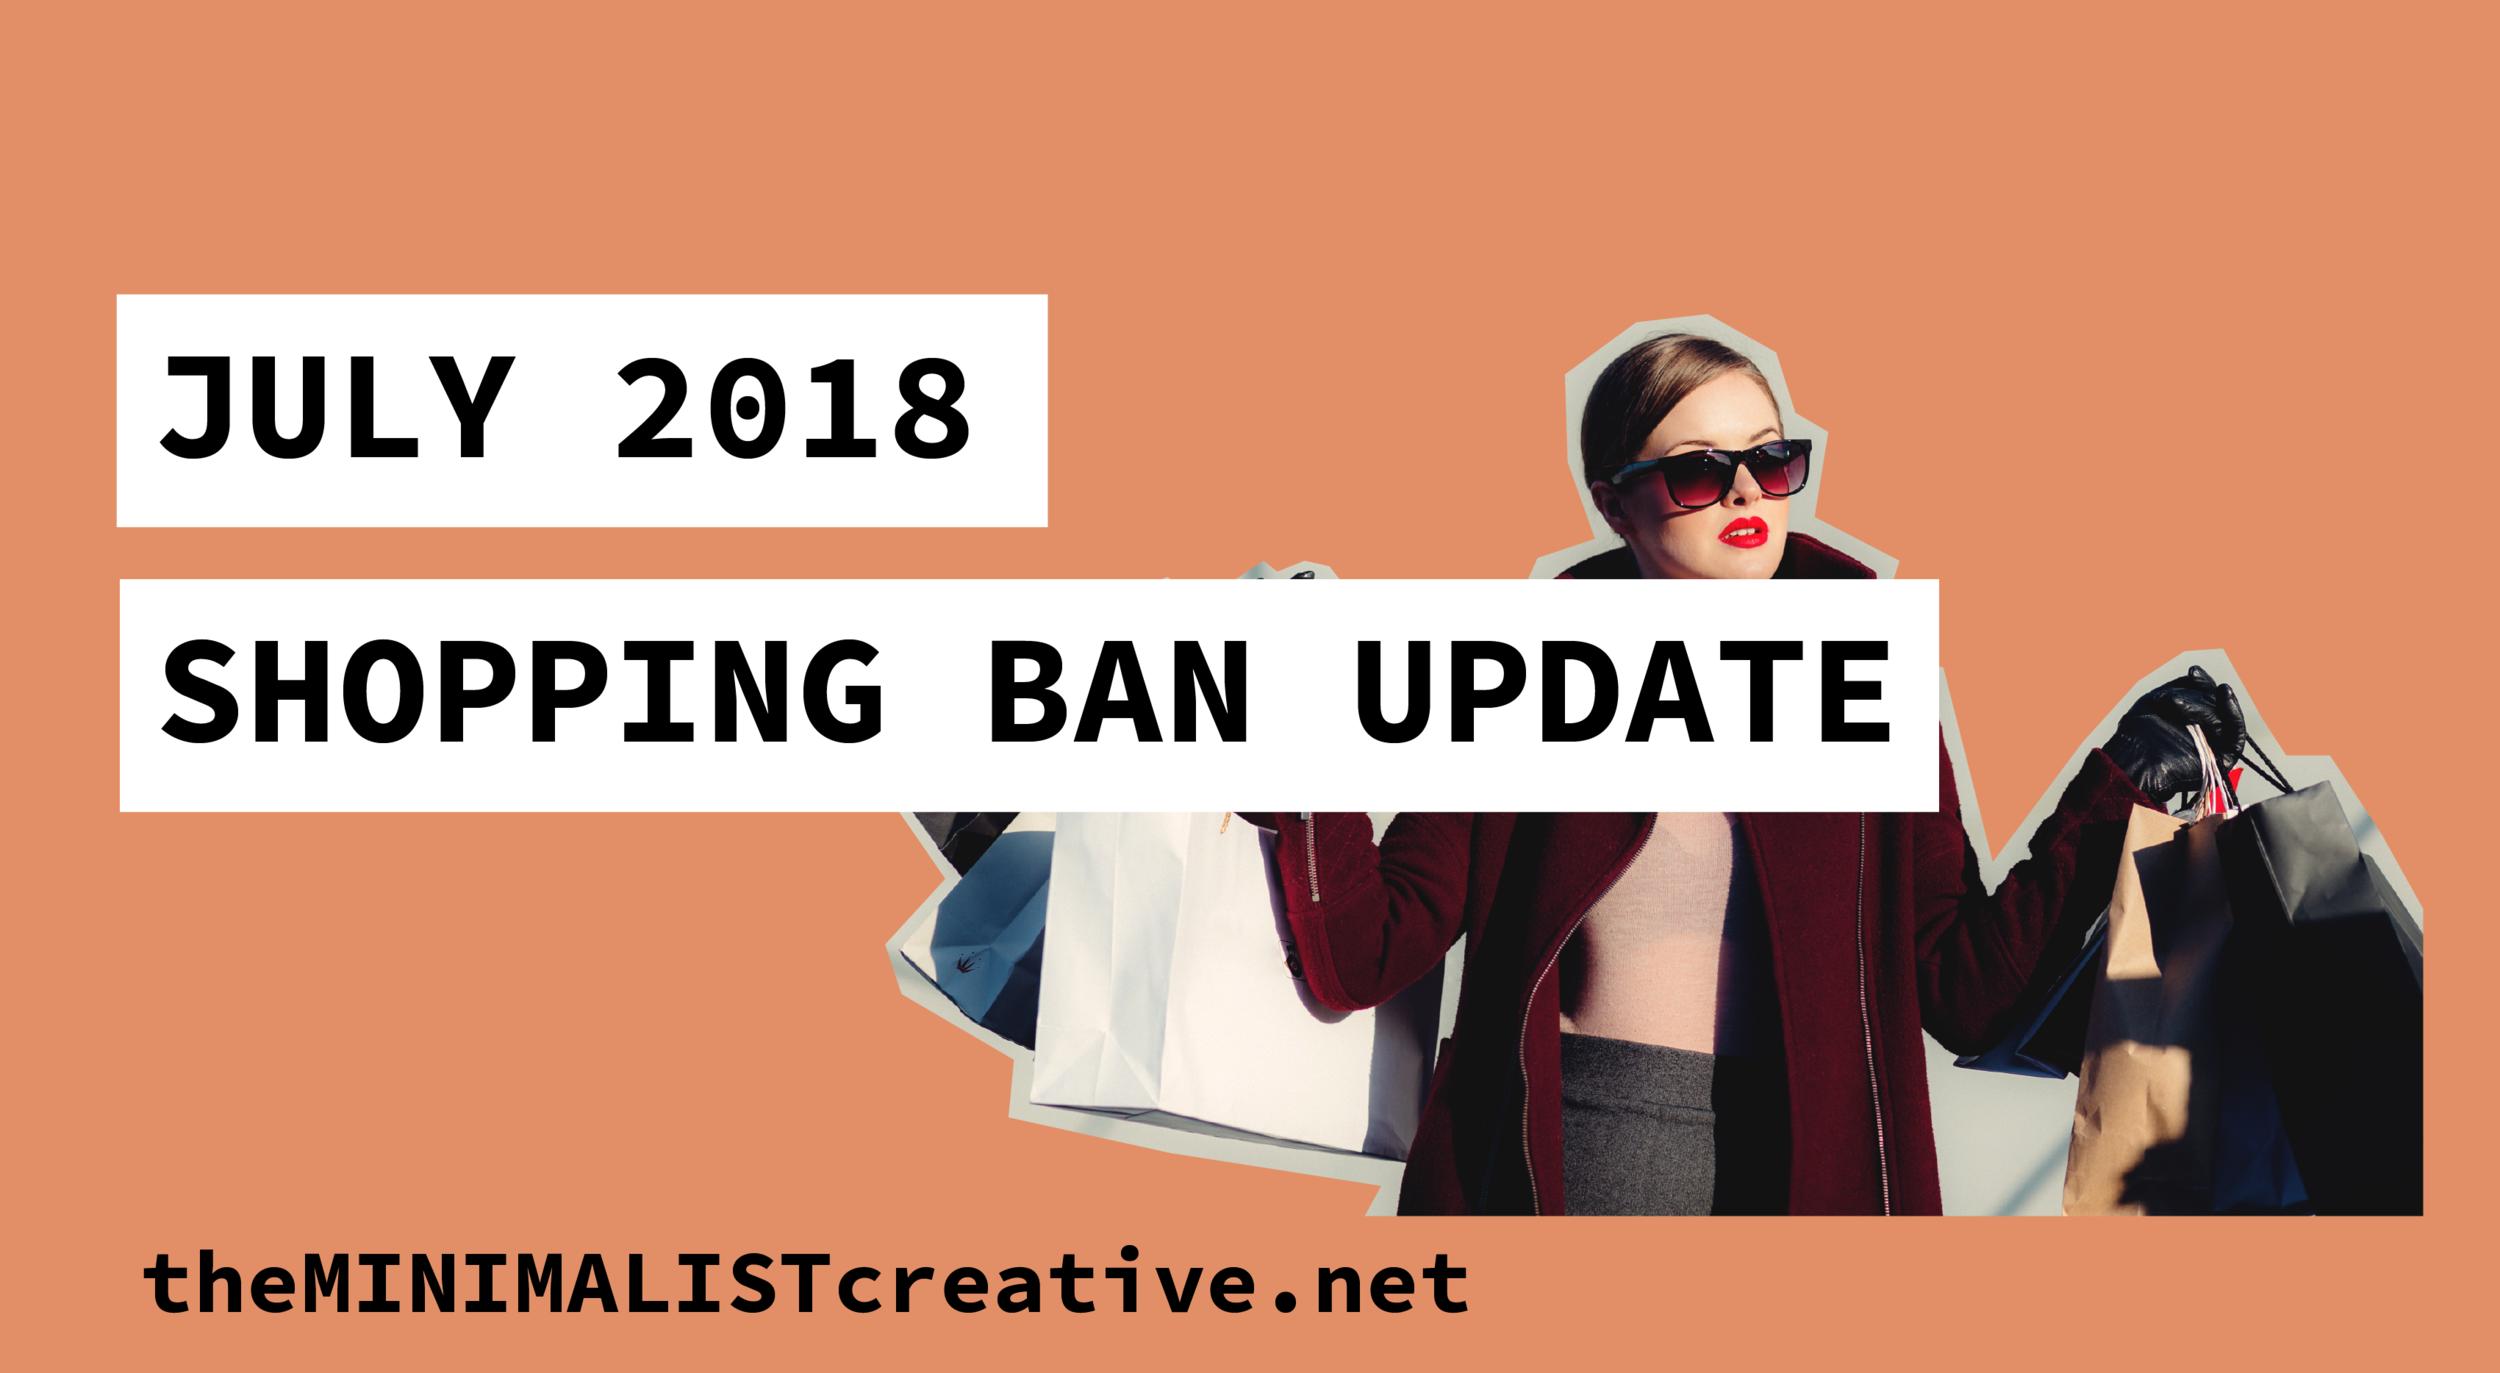 July 2018 Shopping Ban Update